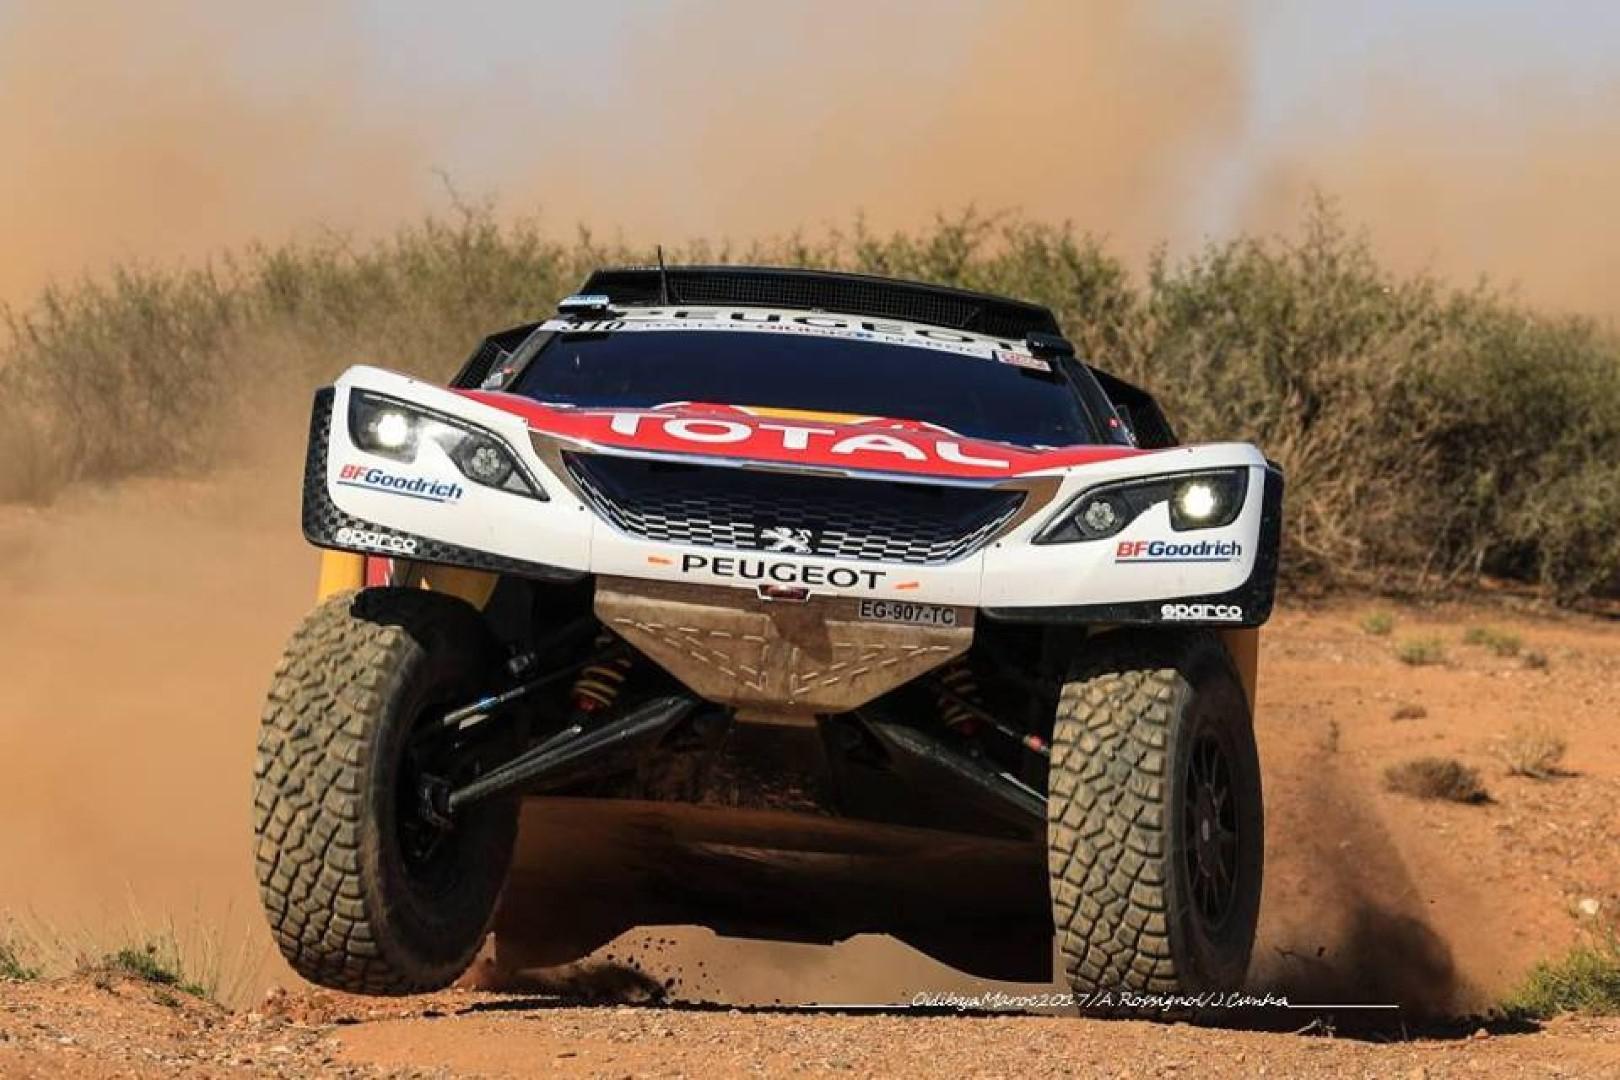 Dakar 2018 : Peugeot a conclu son ultime séance d'essai au Maroc.